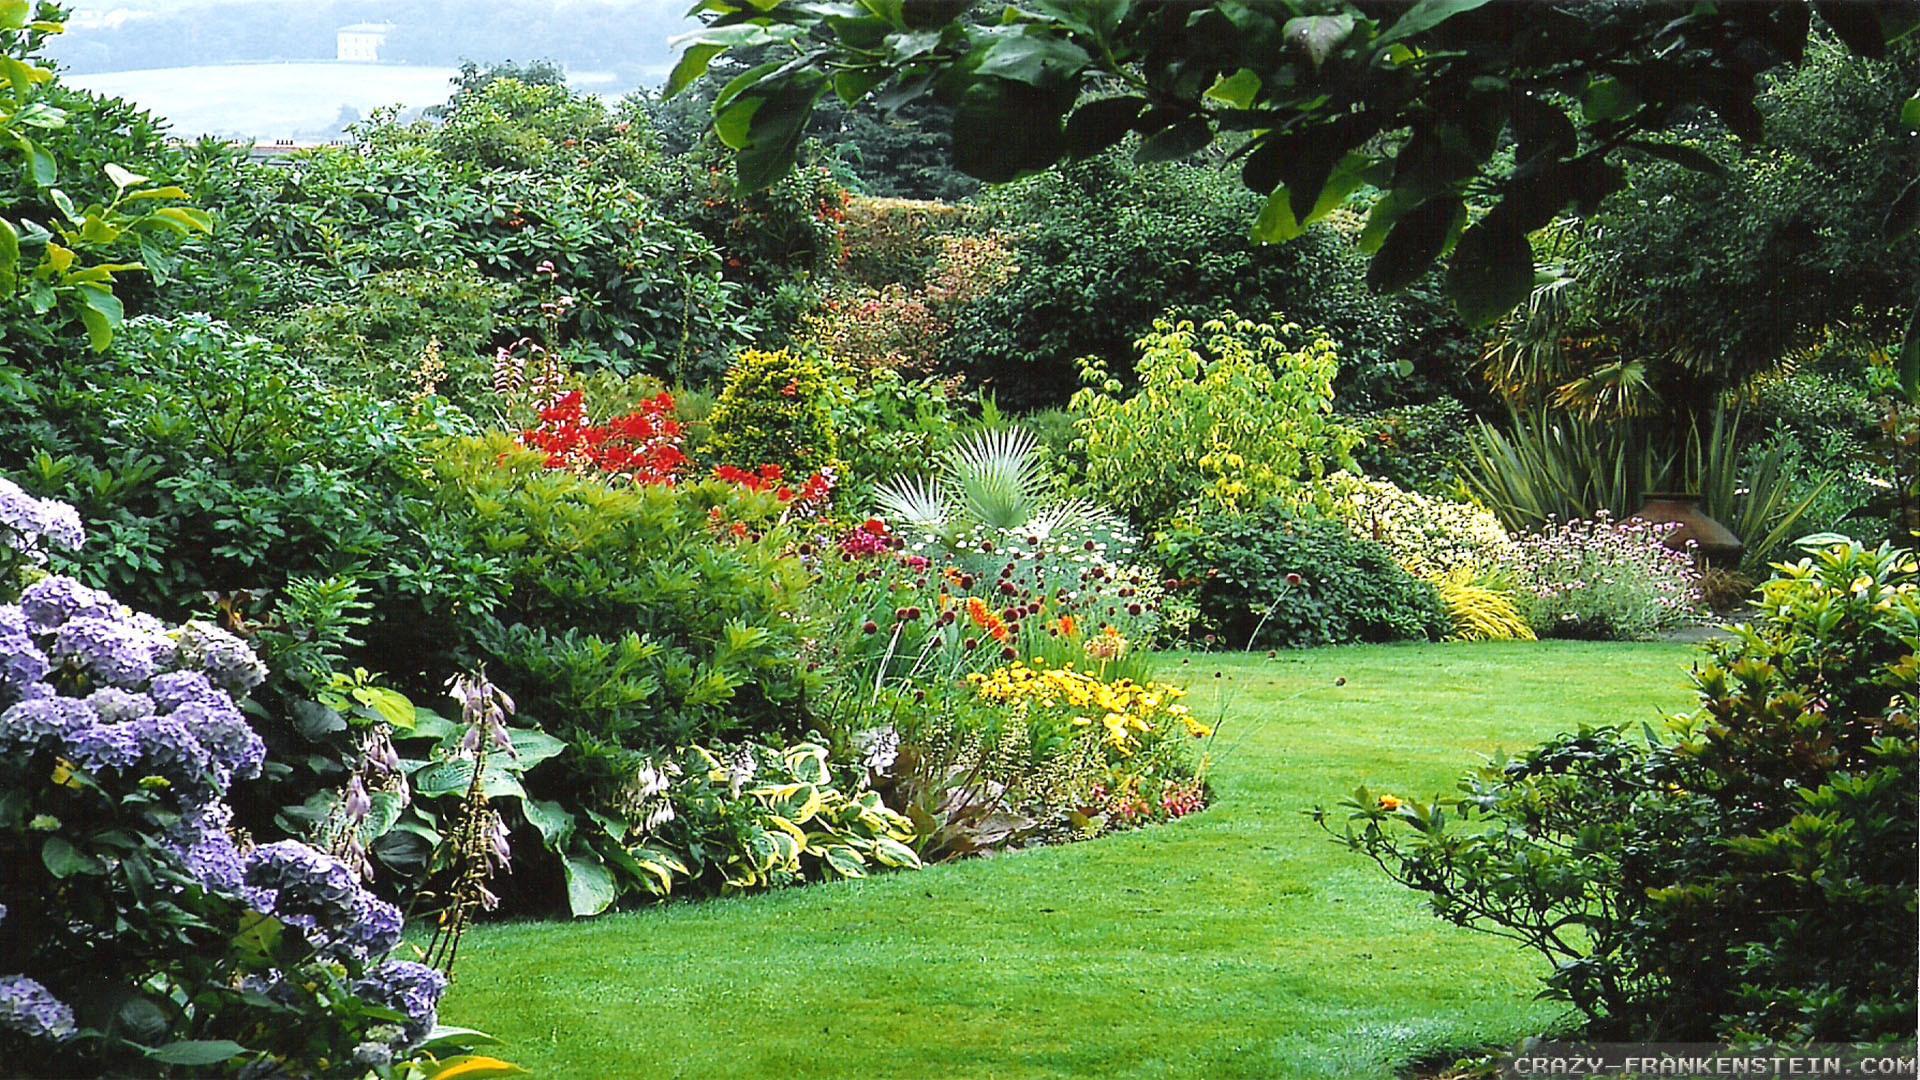 Beautiful Garden Wallpaper Free Download Hd Labzada Wallpaper